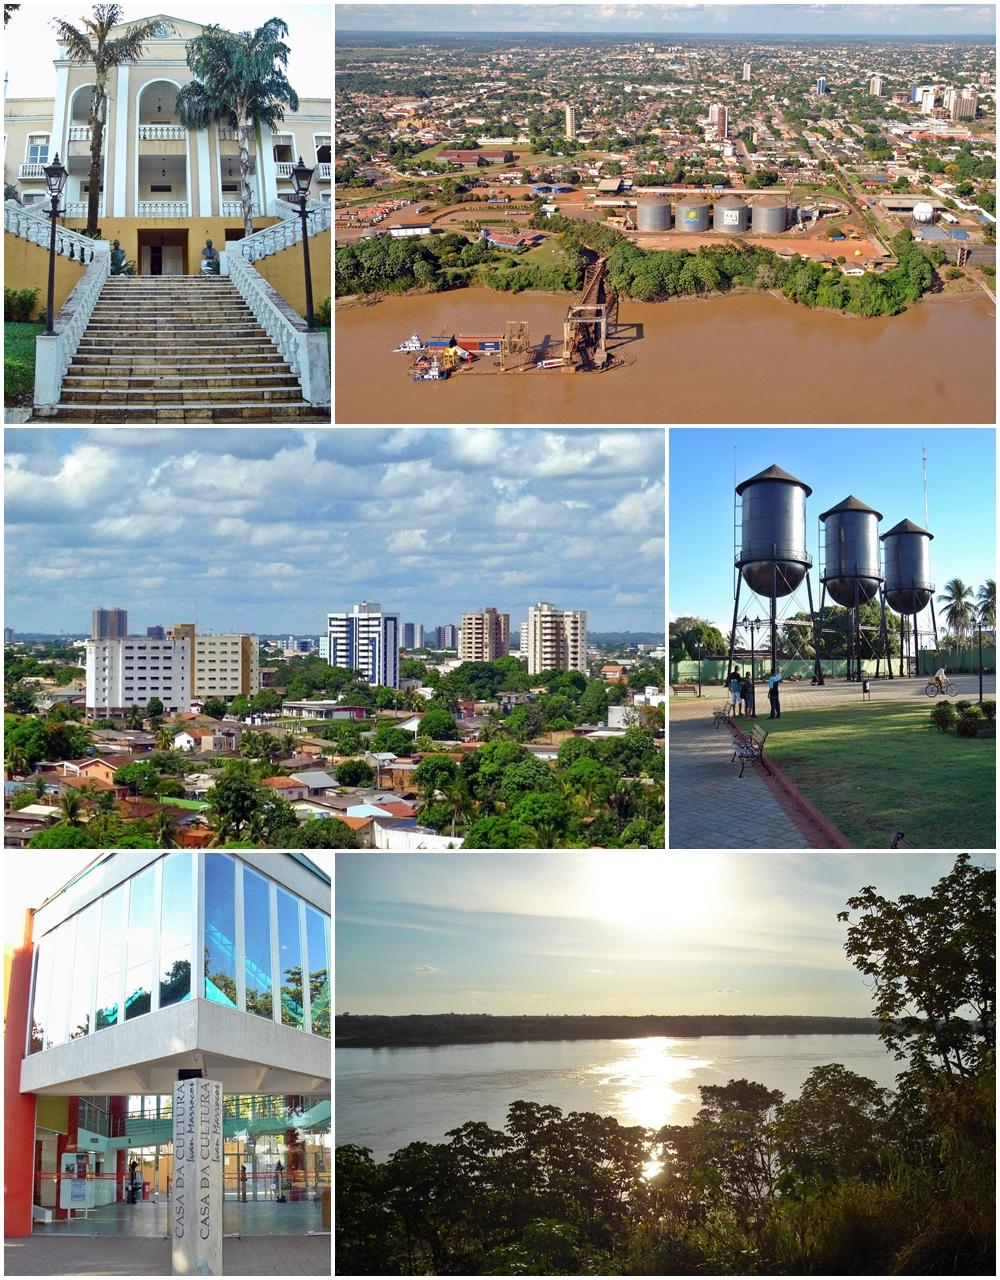 Porto Velho Rondônia fonte: upload.wikimedia.org